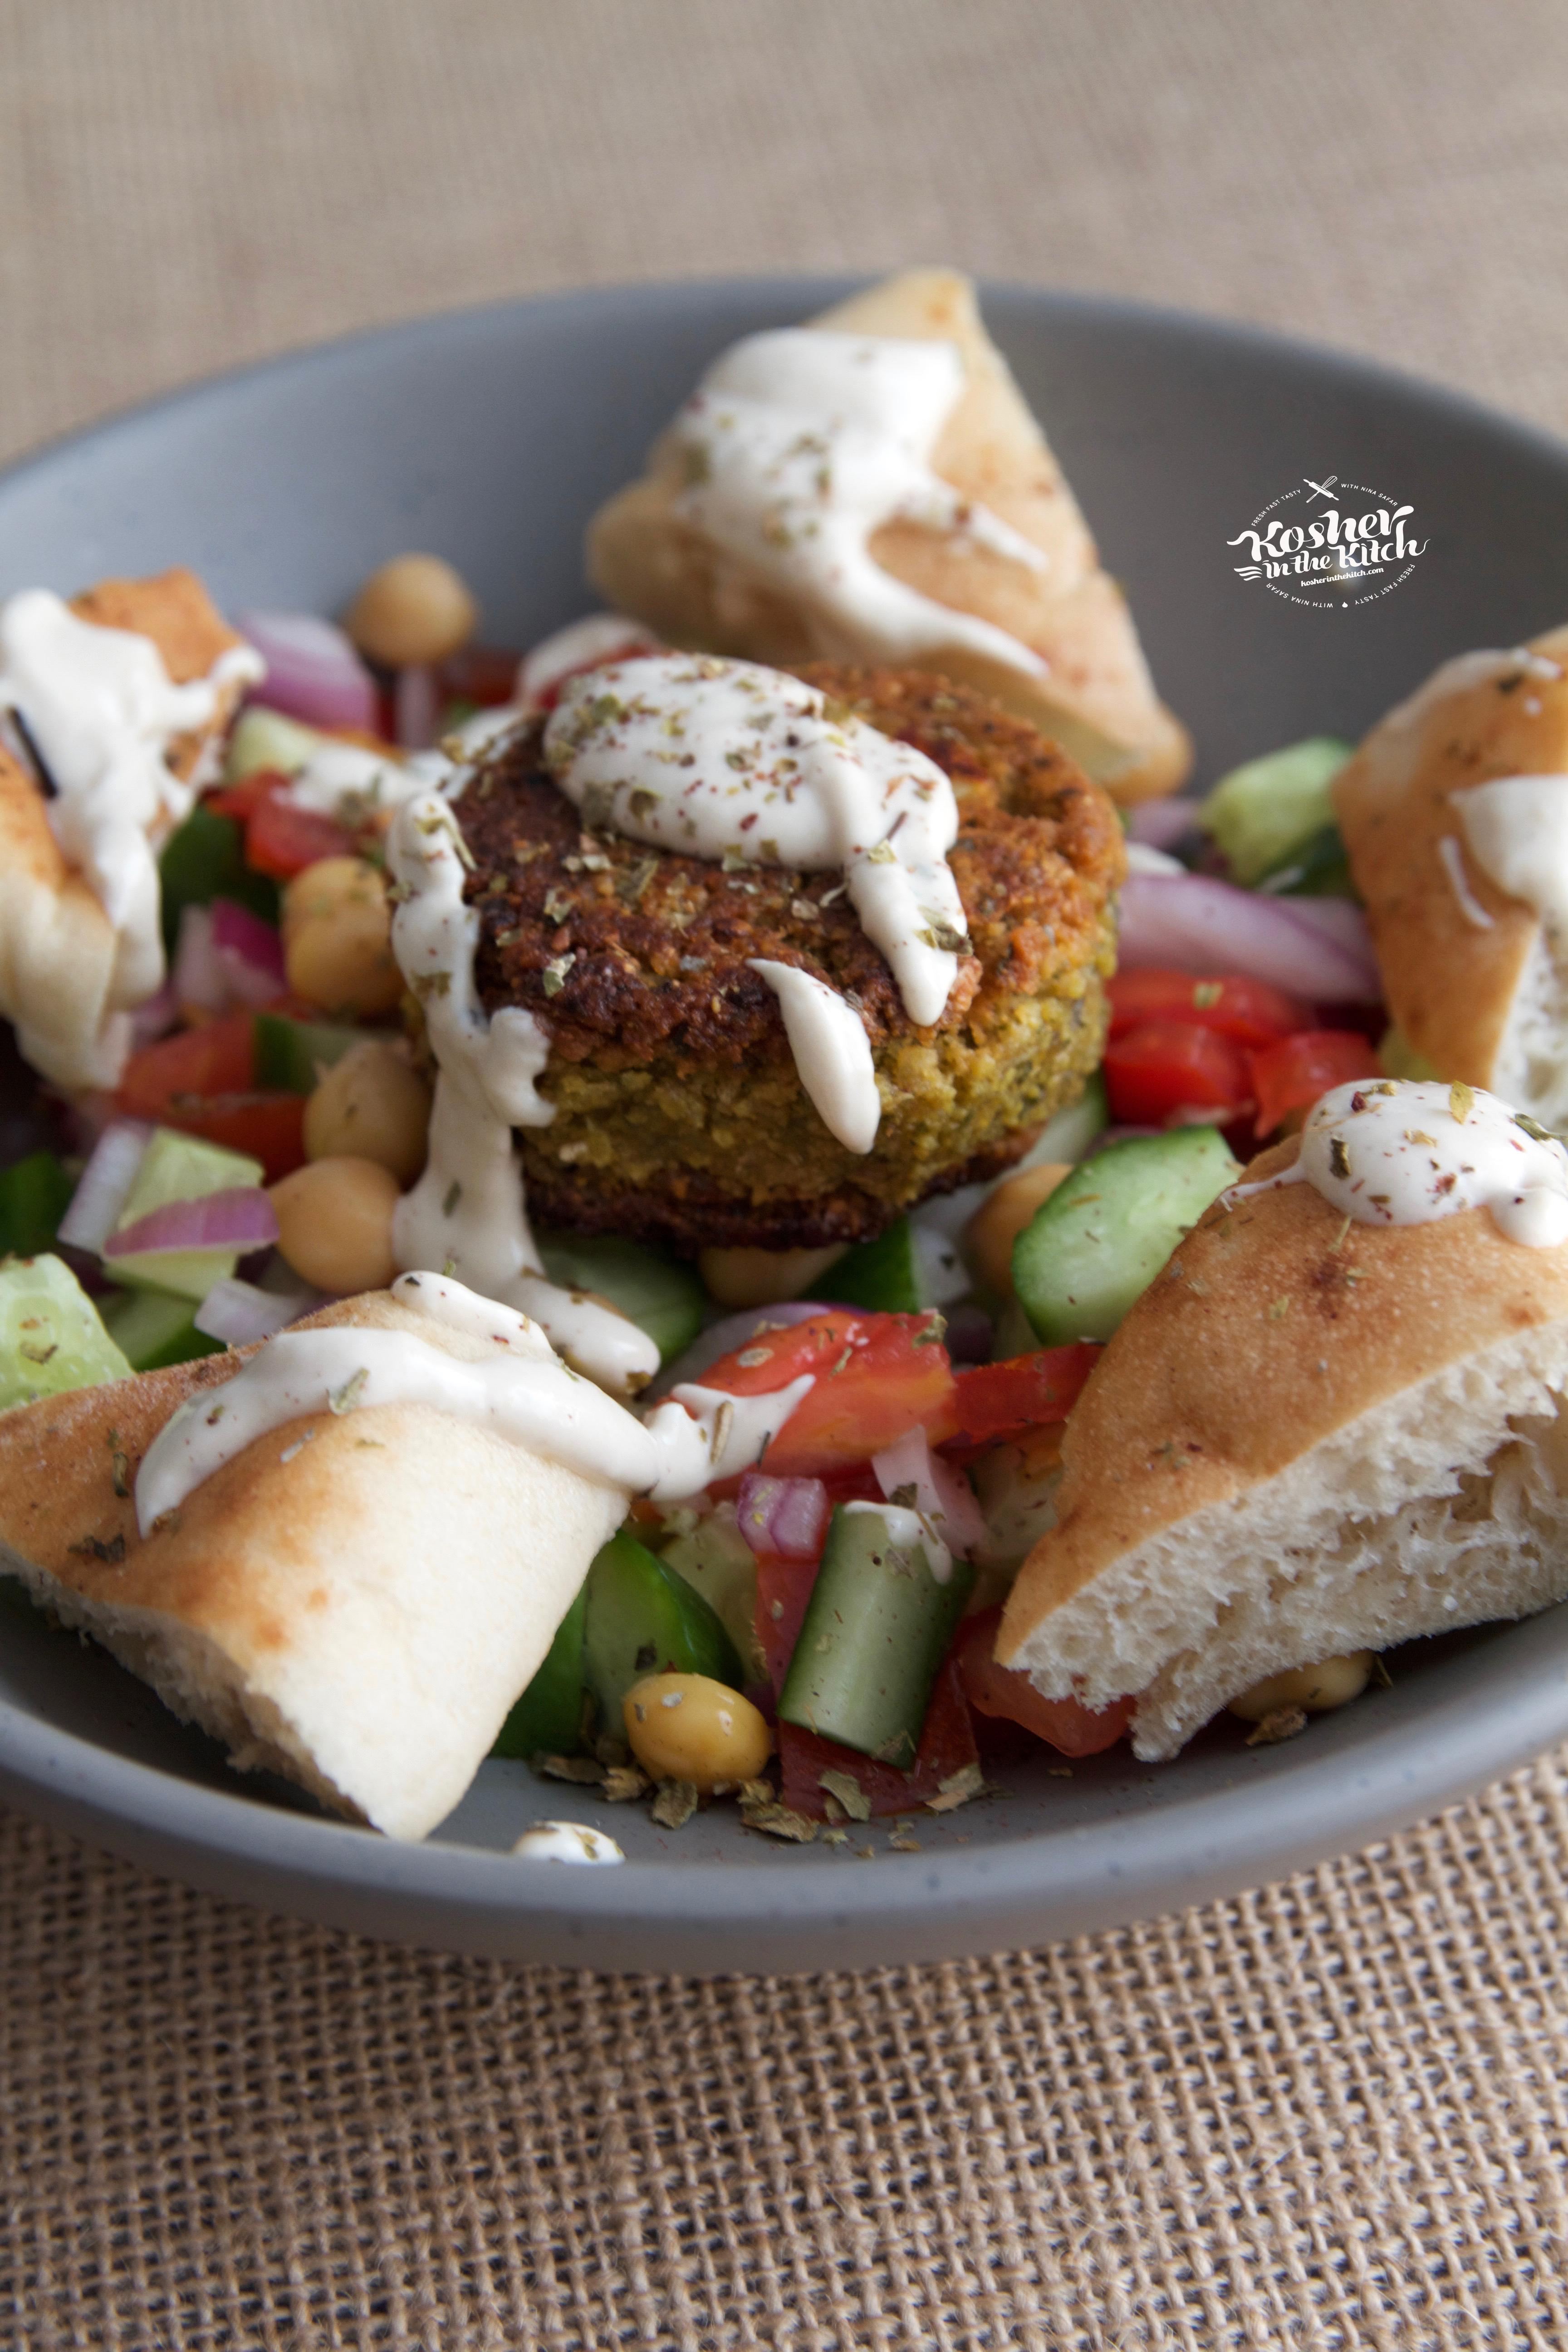 Stuffed Falafel Balls served over Israeli Salad with Pita Chips